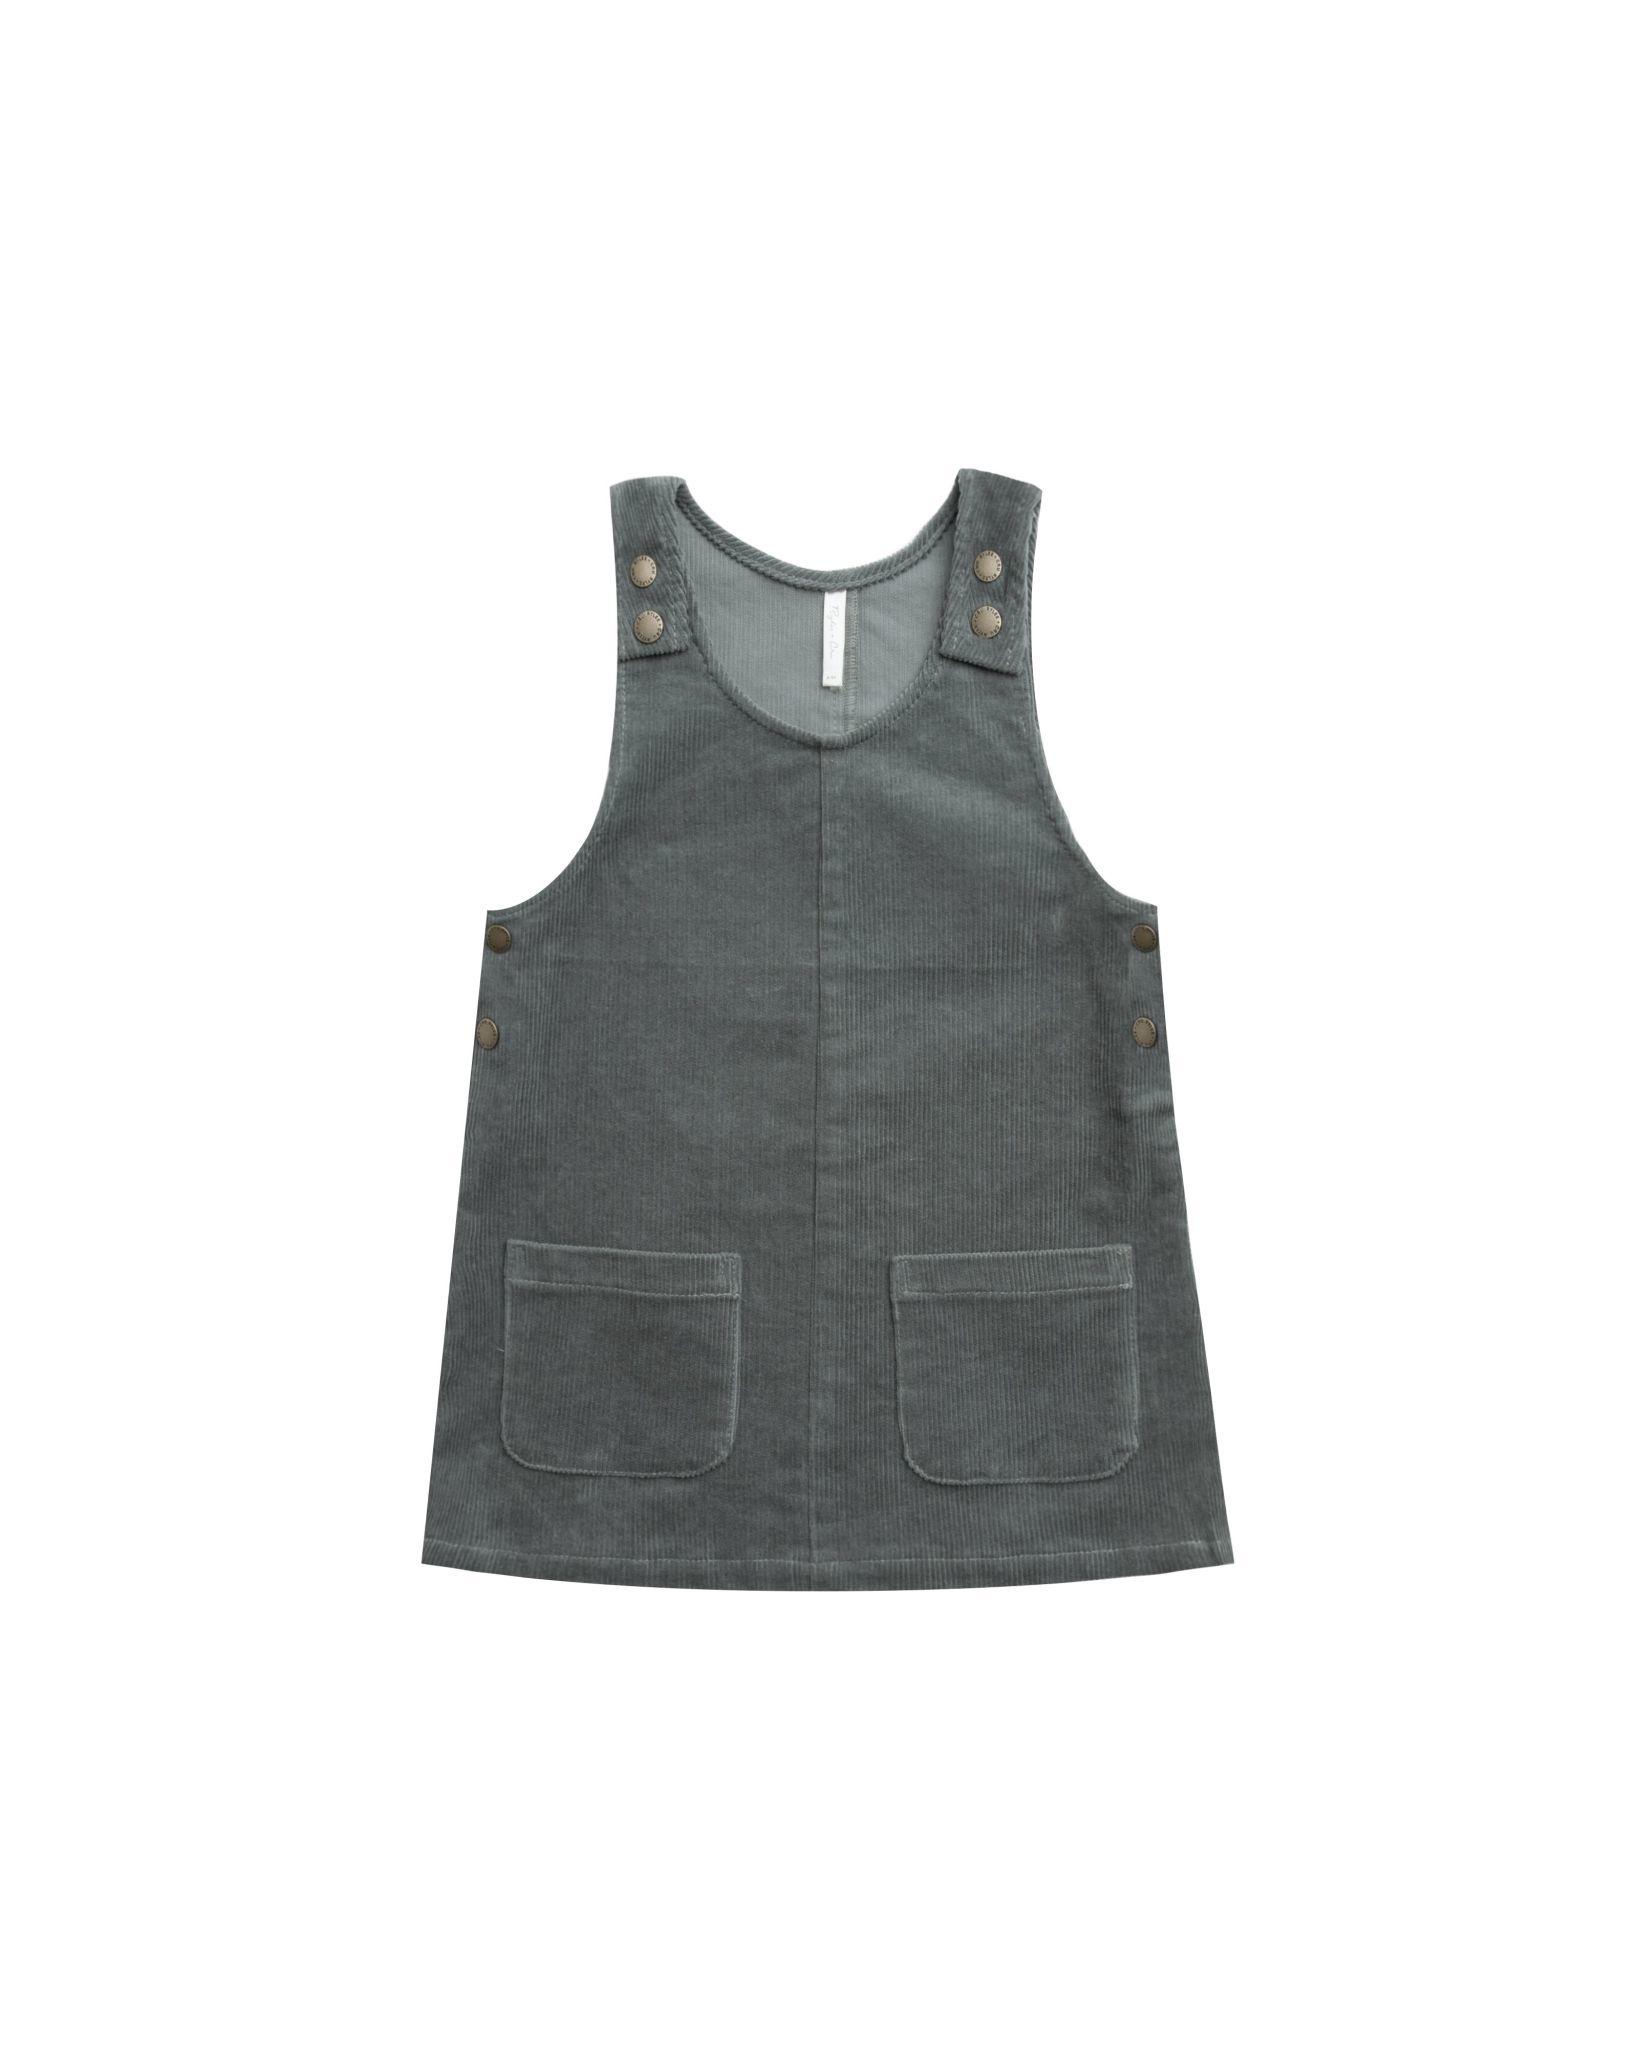 Rylee and Cru Rylee & Cru Odette Overall Dress